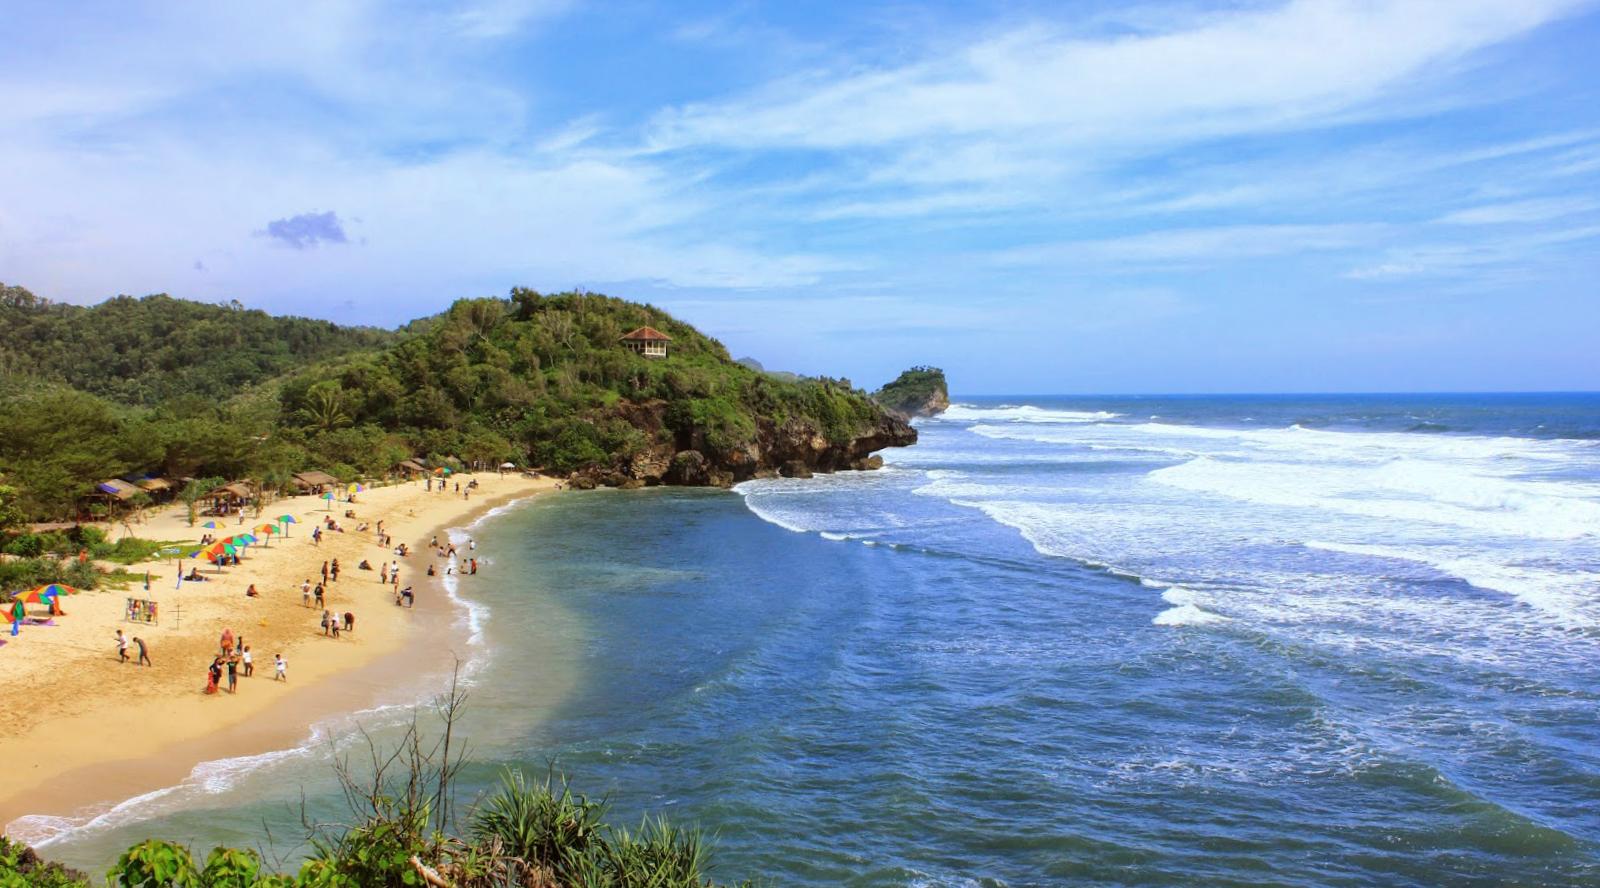 wisata pantai indah pasir putih manis di Joga